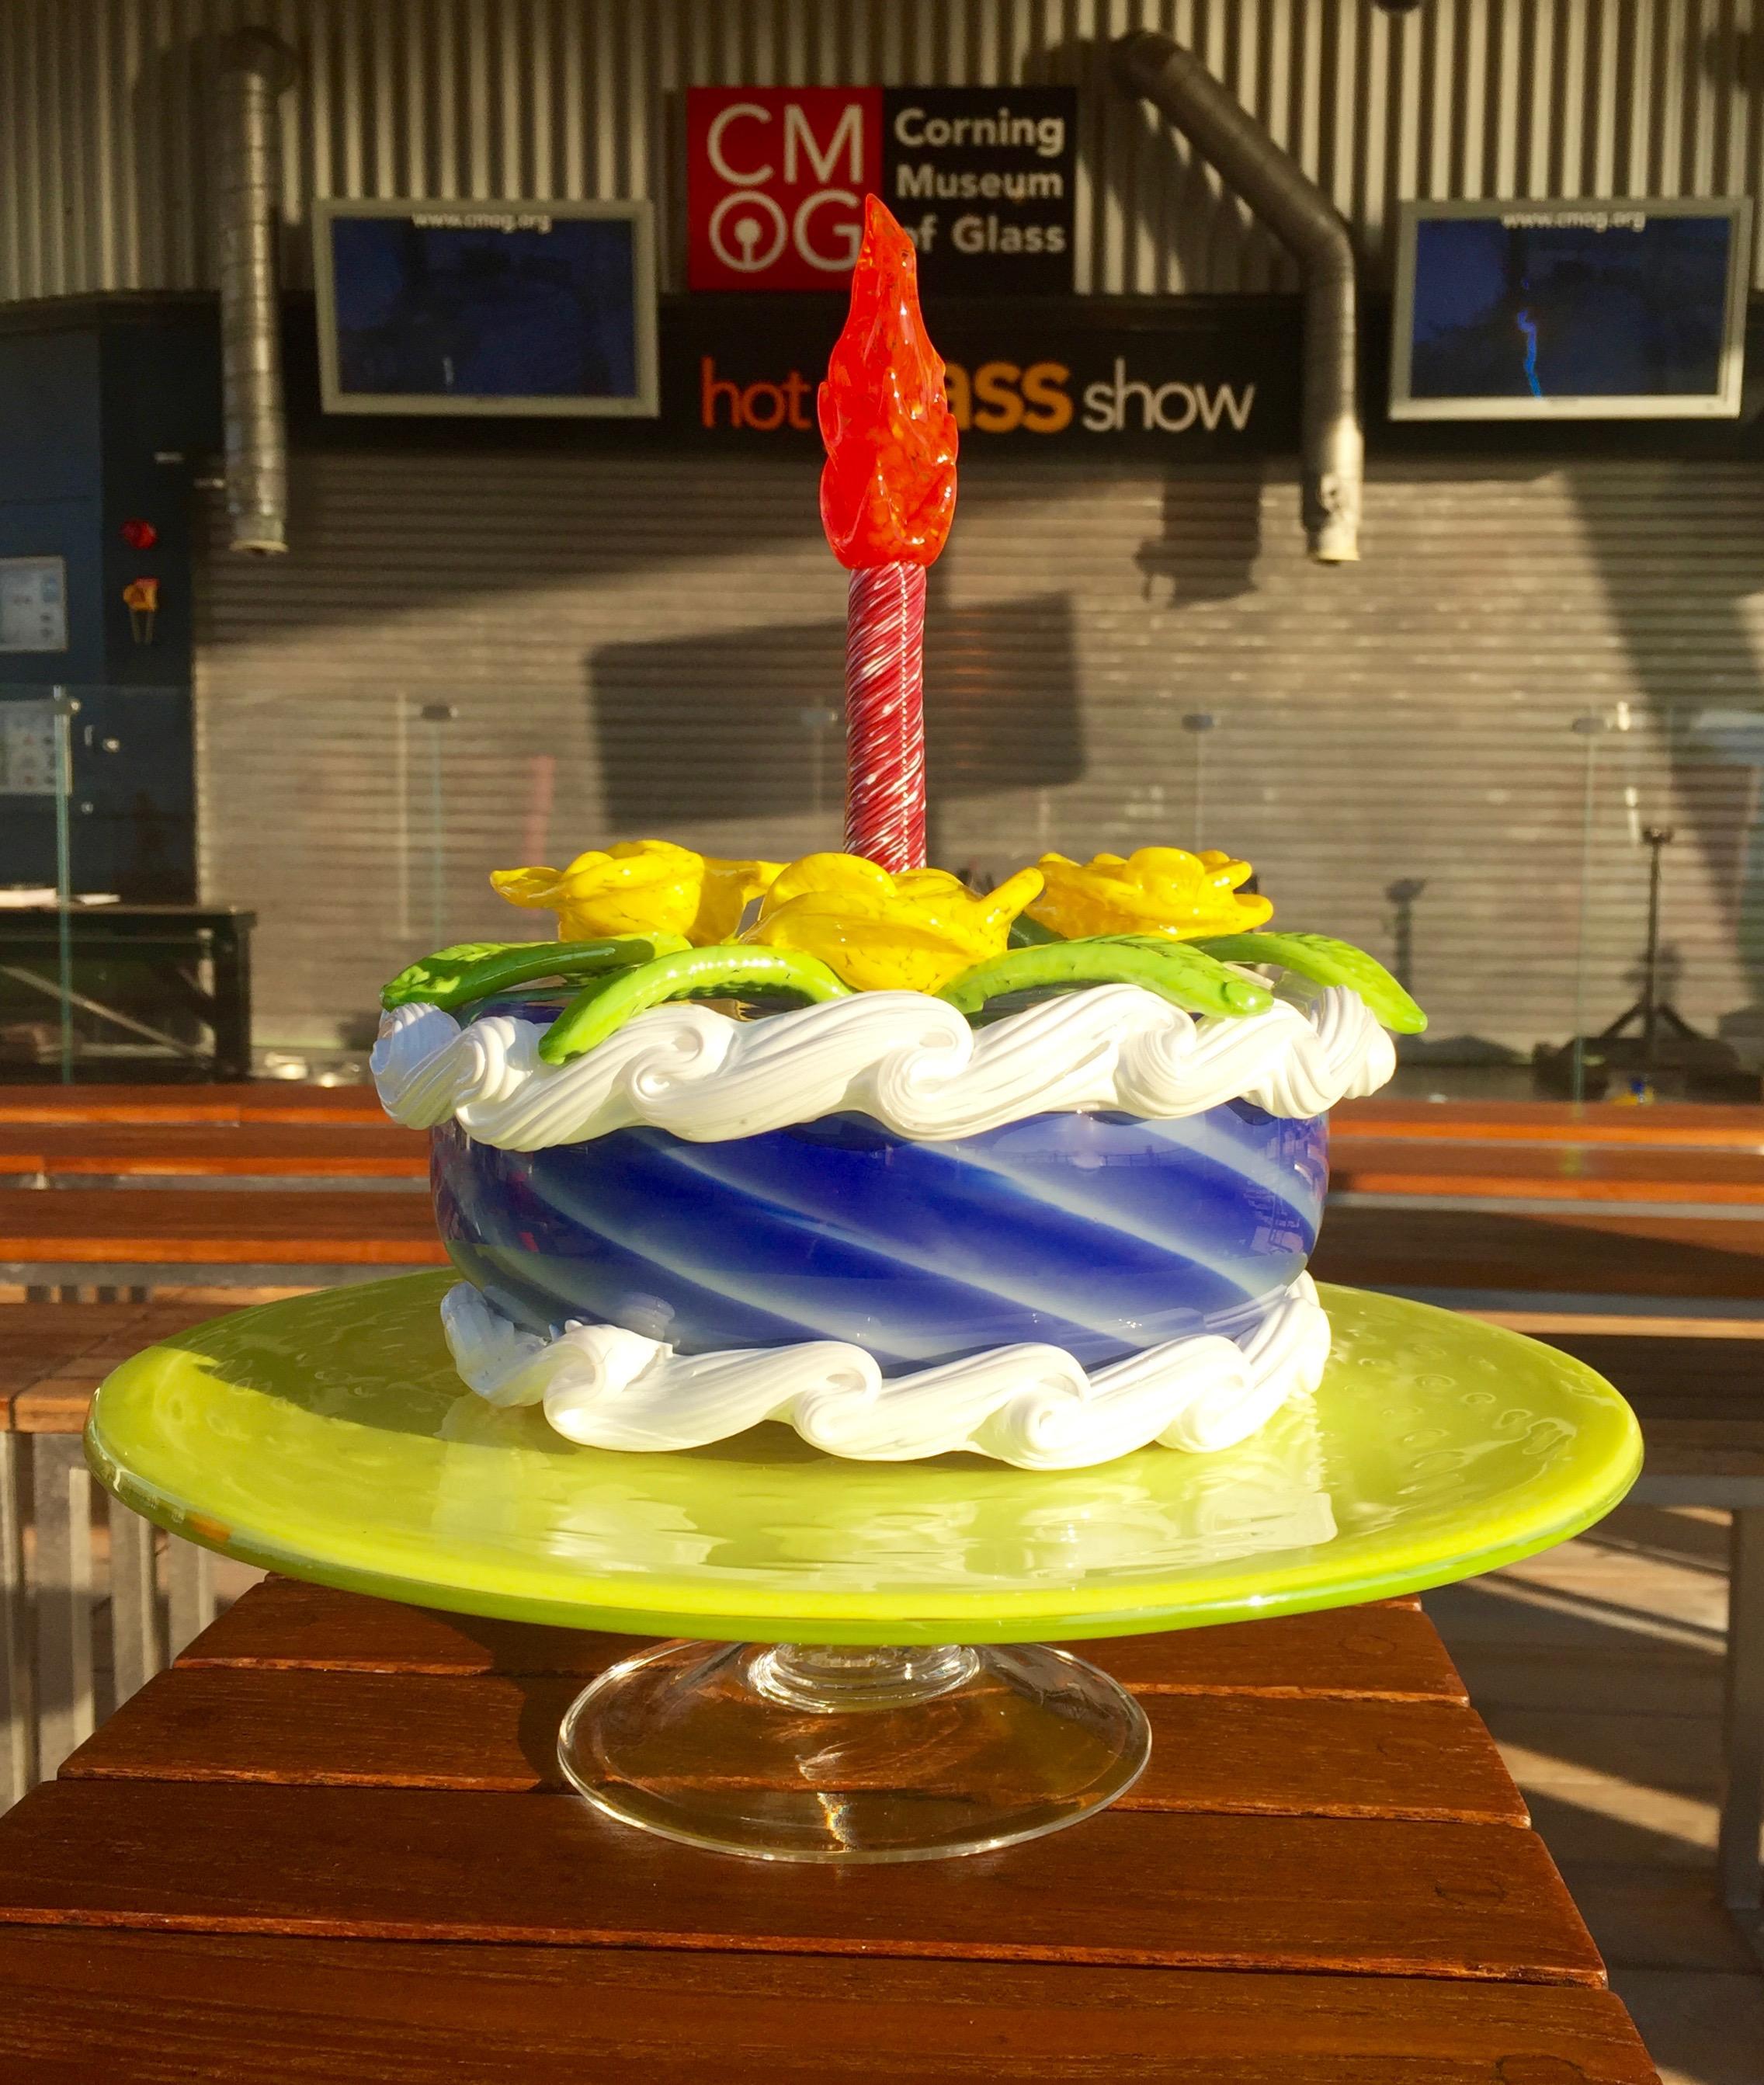 x Cake Plate with Cake.jpg